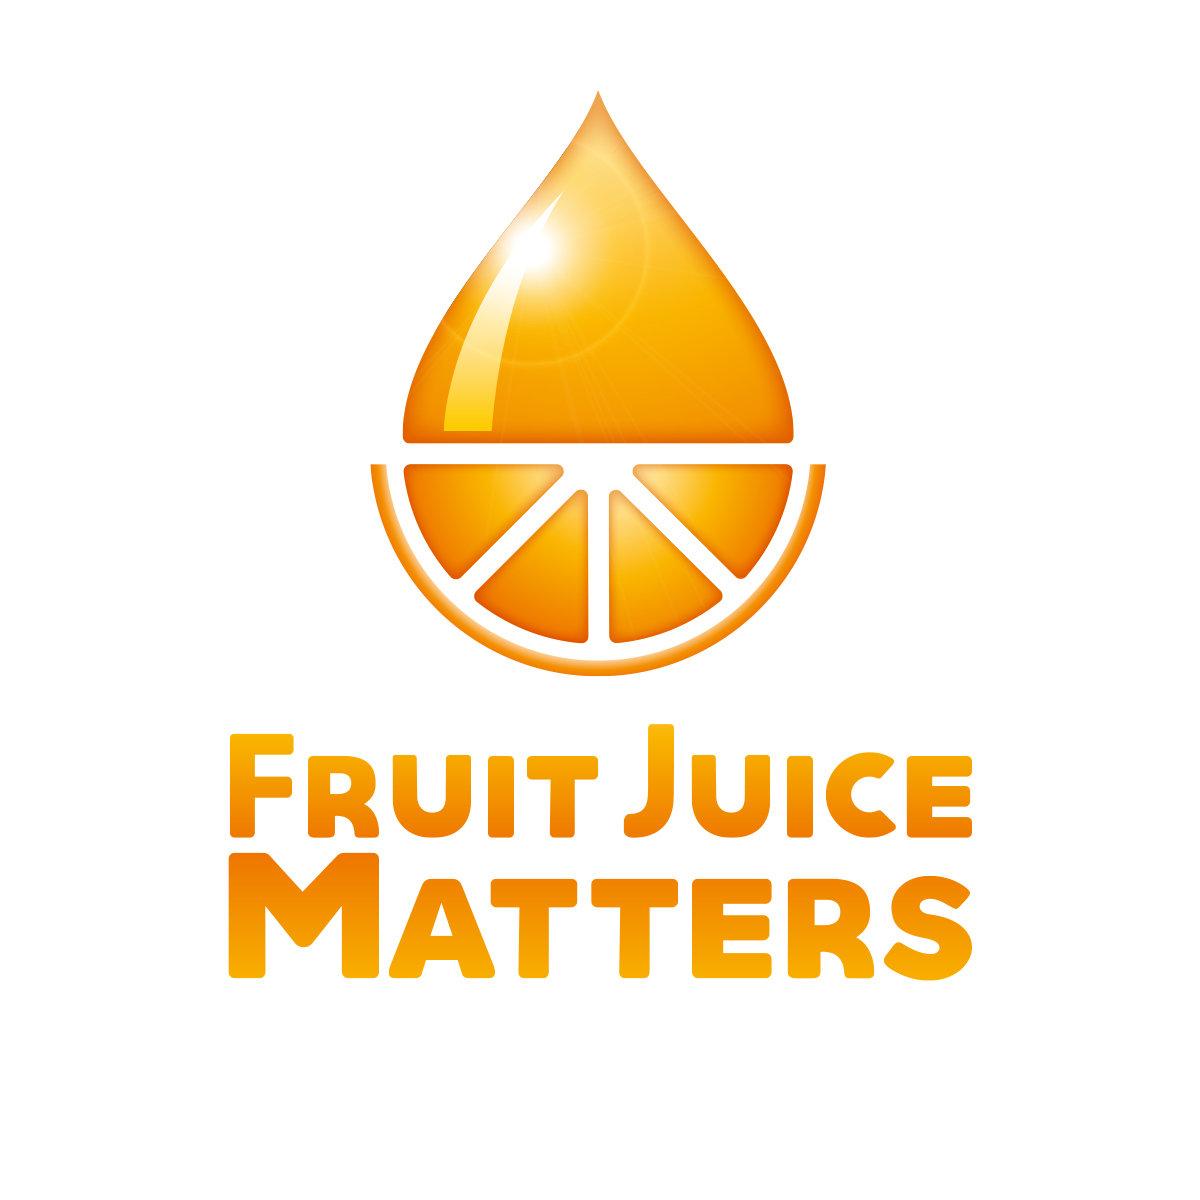 Fruit Juice Matters | AIJN - European Fruit Juice Association